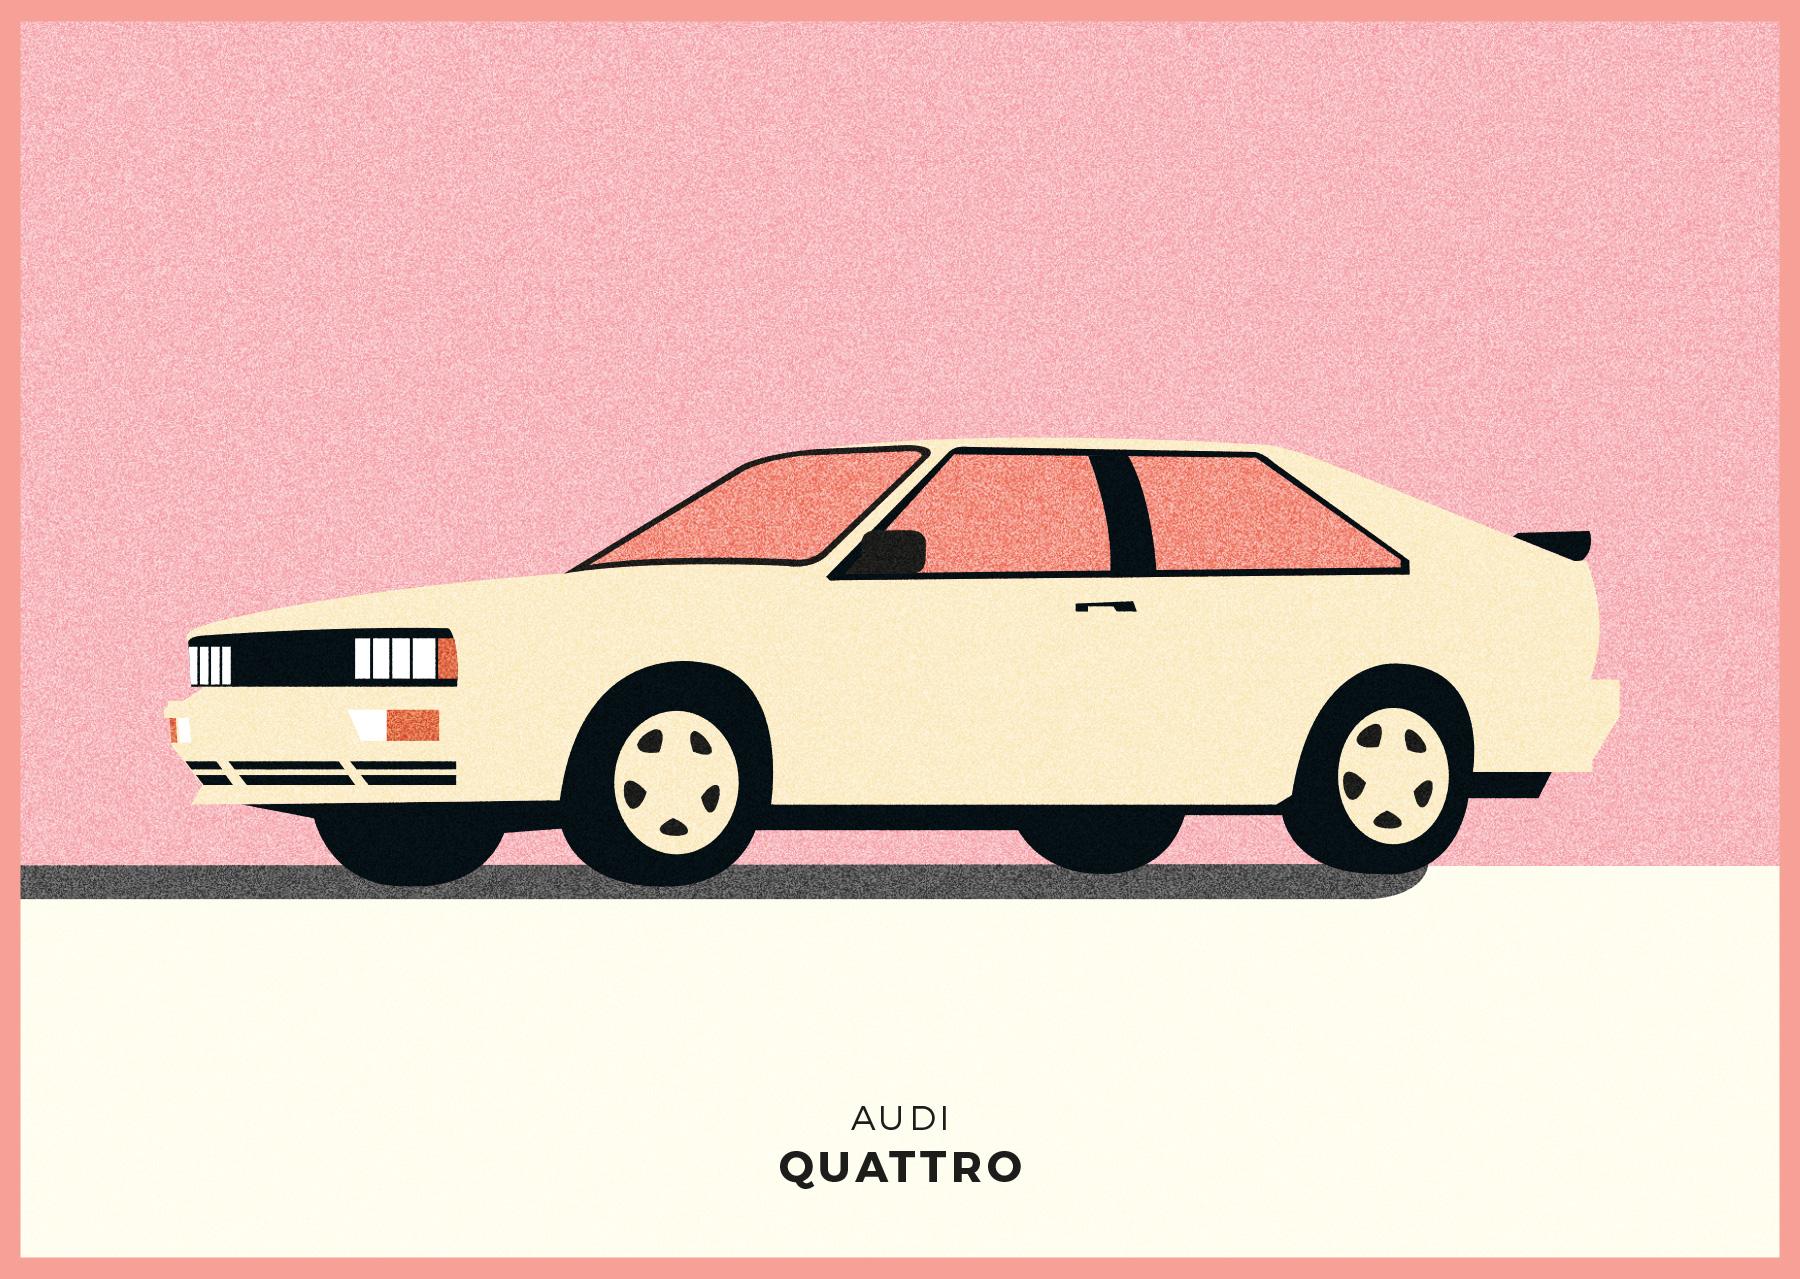 Carole_Chevalier-Iconic-cars-1.jpg